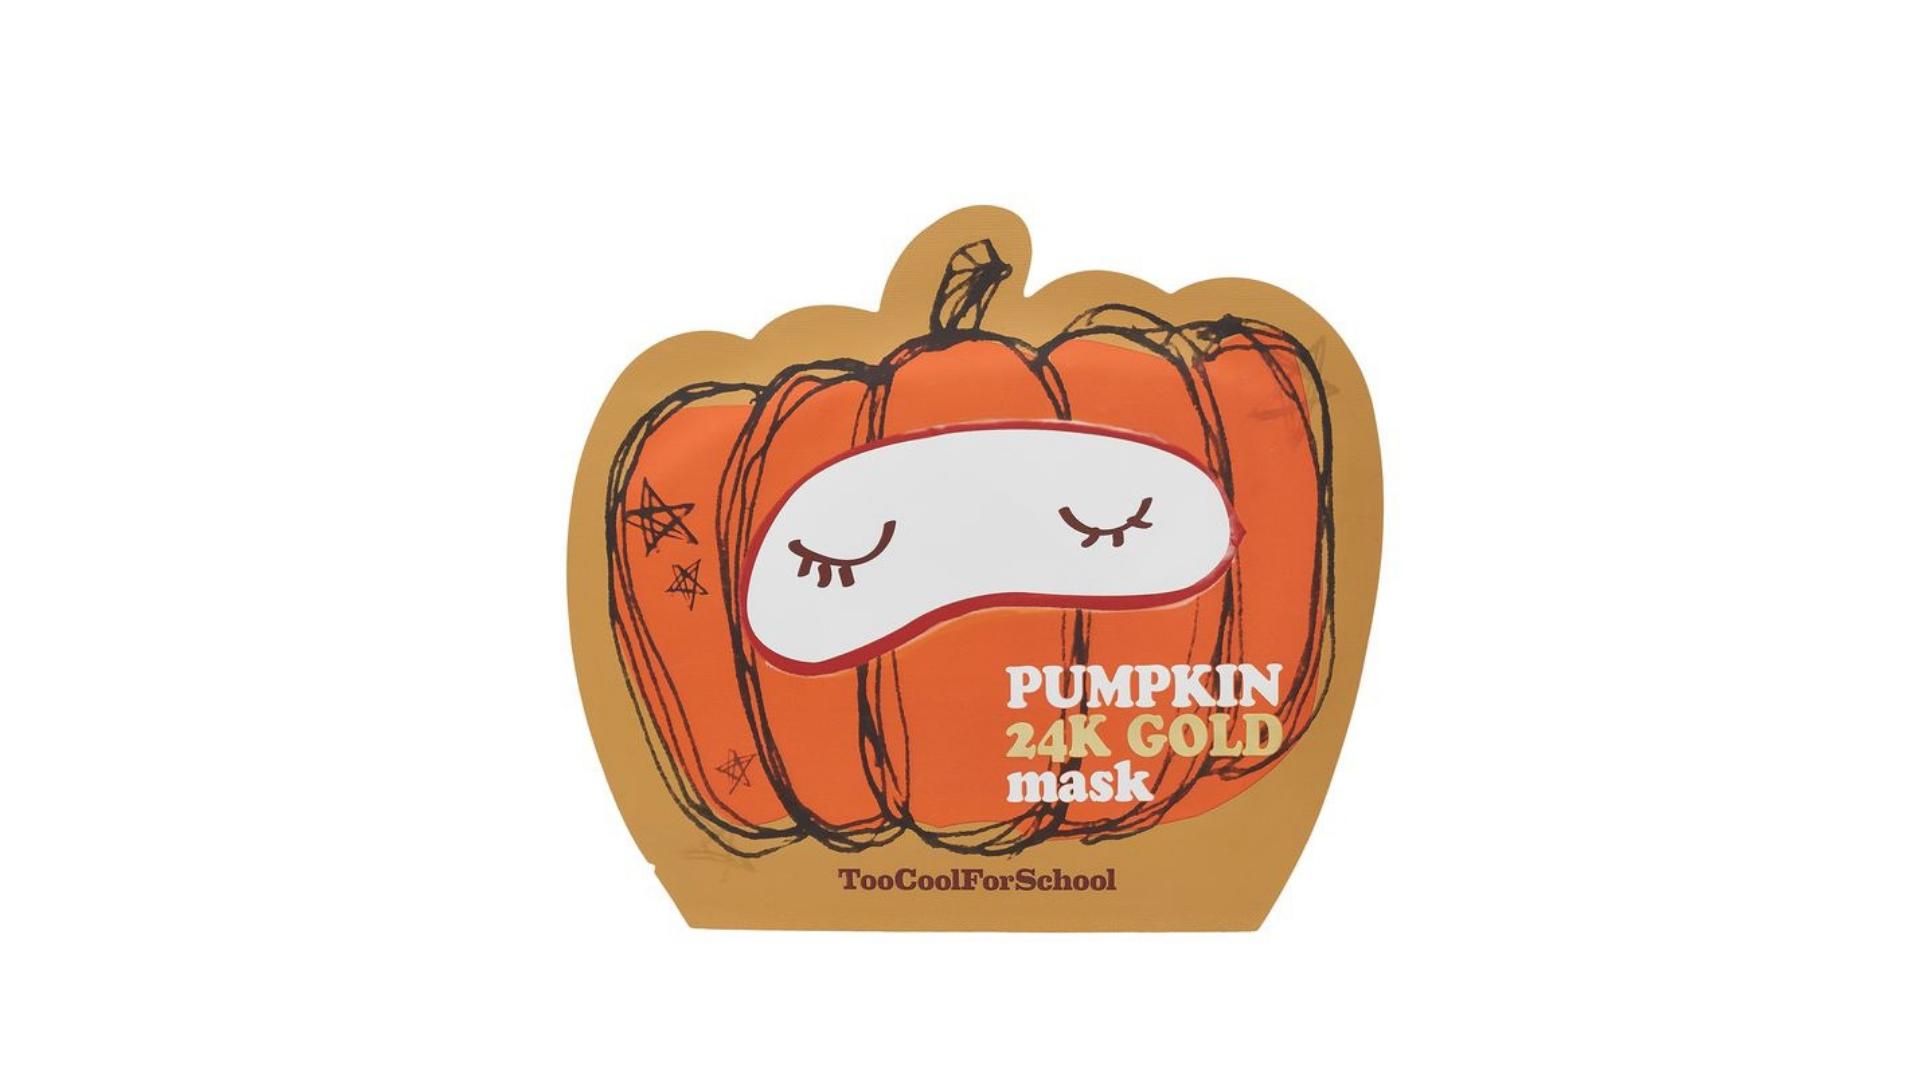 Too Cool For School Pumpkin 24k Mask